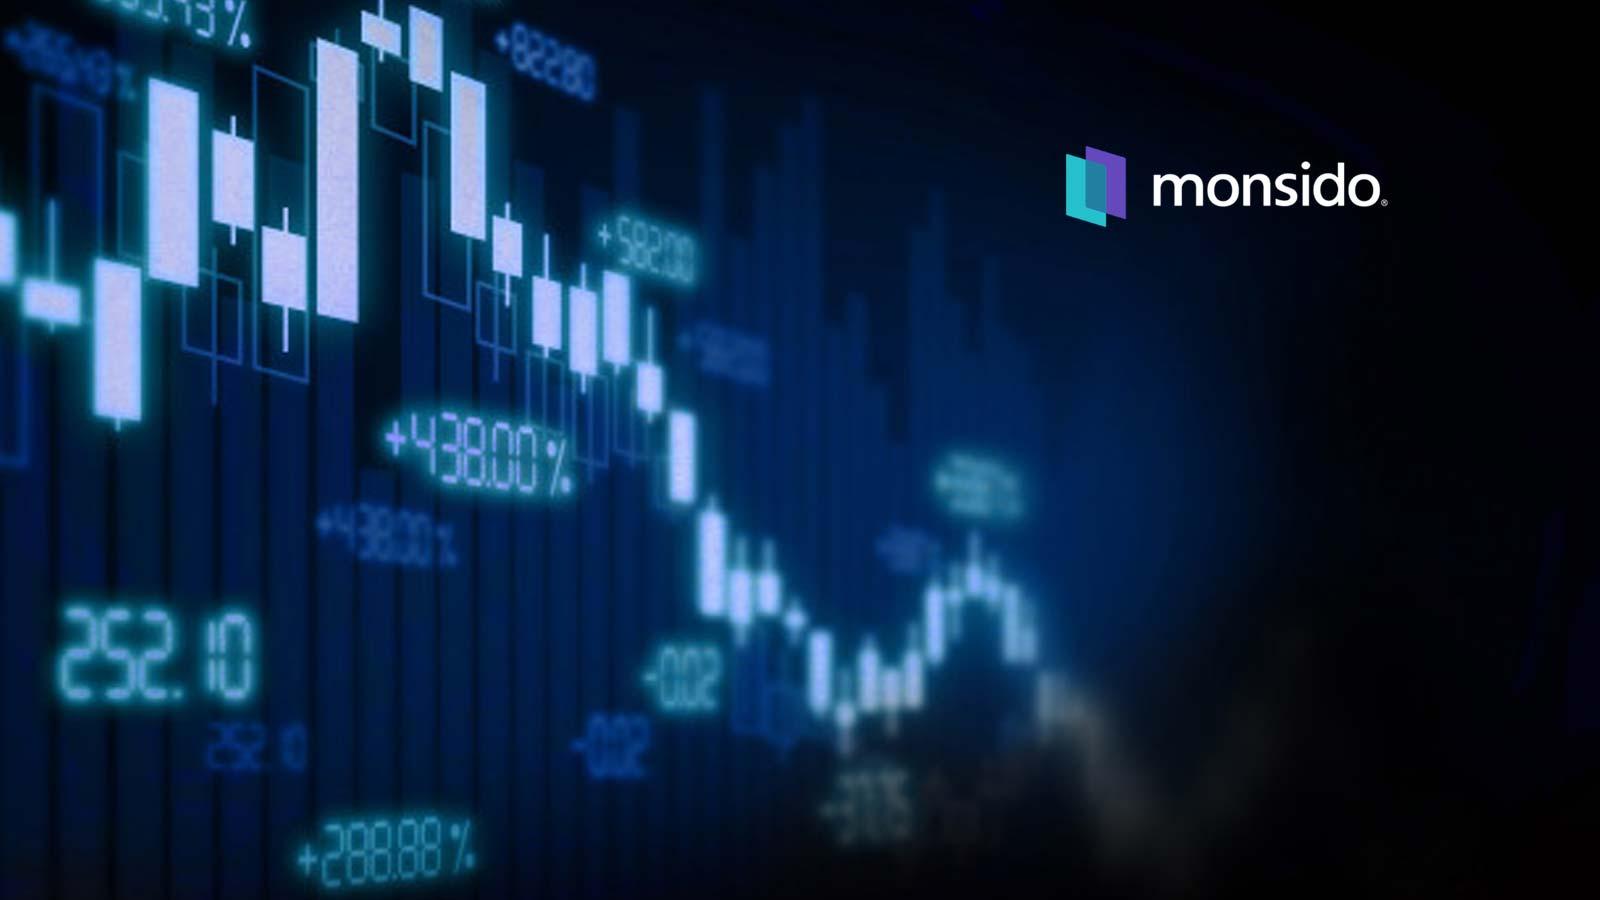 Monsido Announces 16 9 Million Investment by Level Equity and Vaekstfonden.